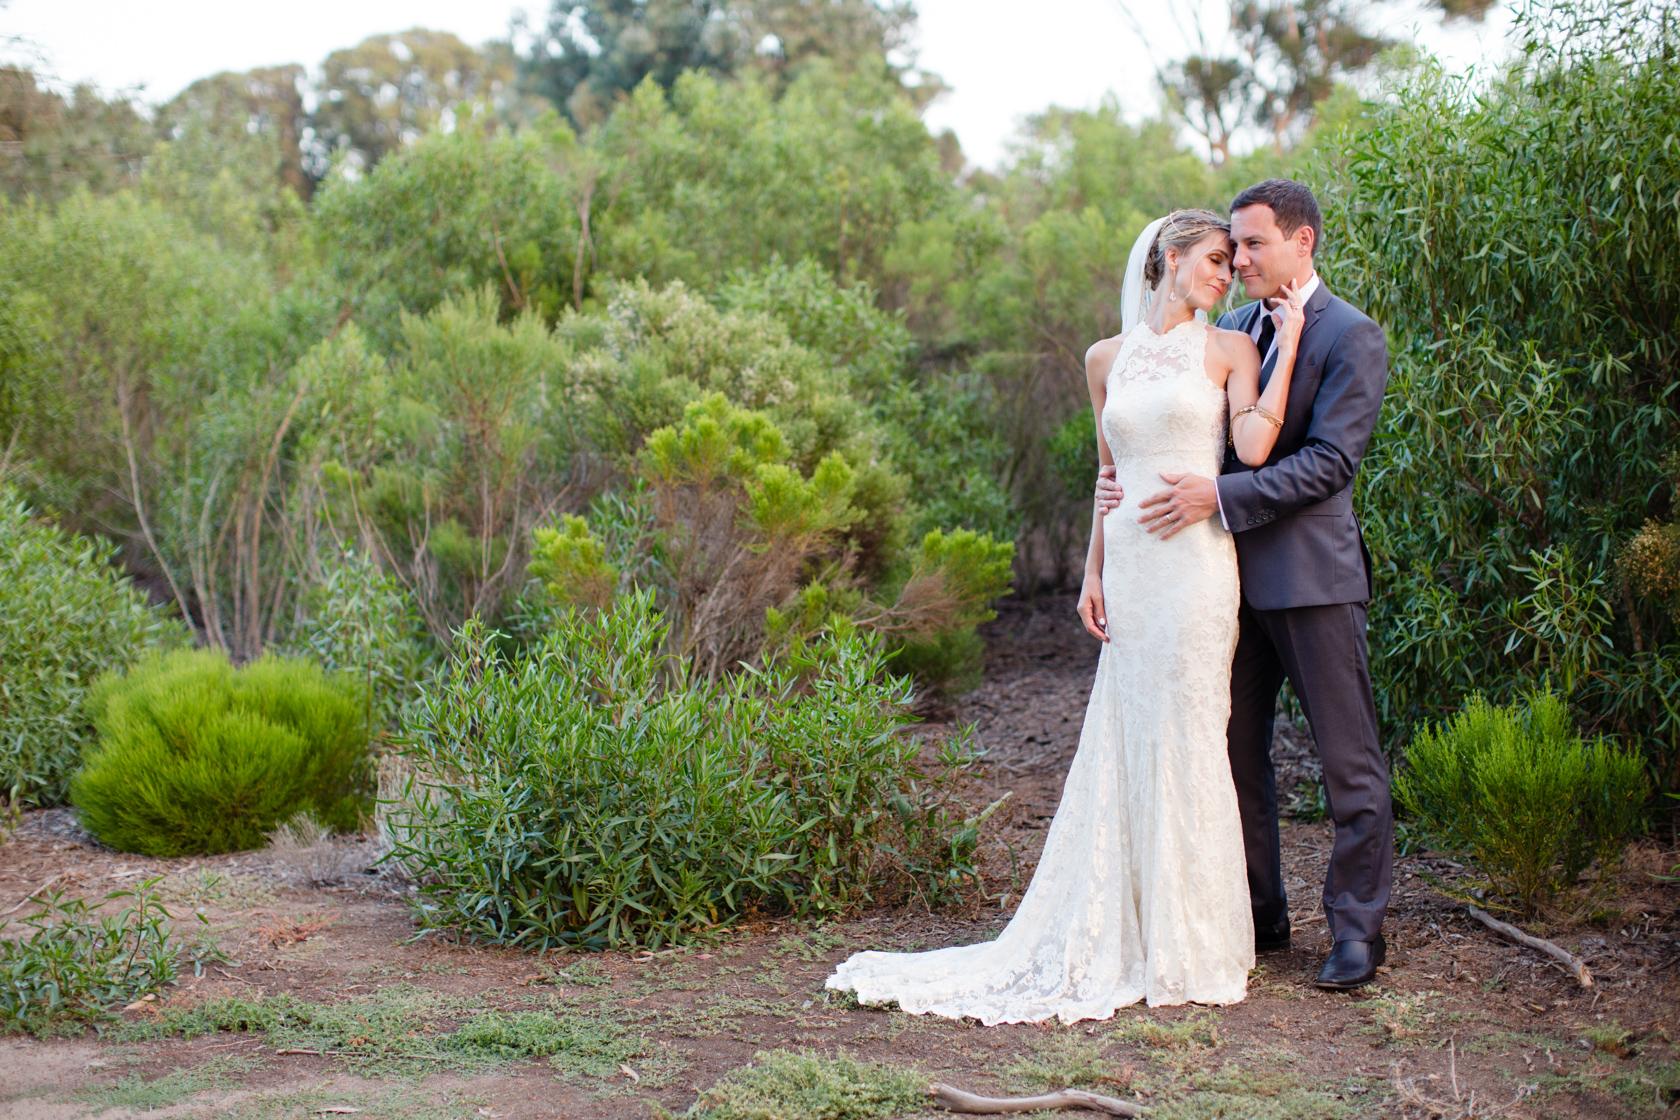 The_Lodge_at_Torrey_Pines_Wedding_003.jpg